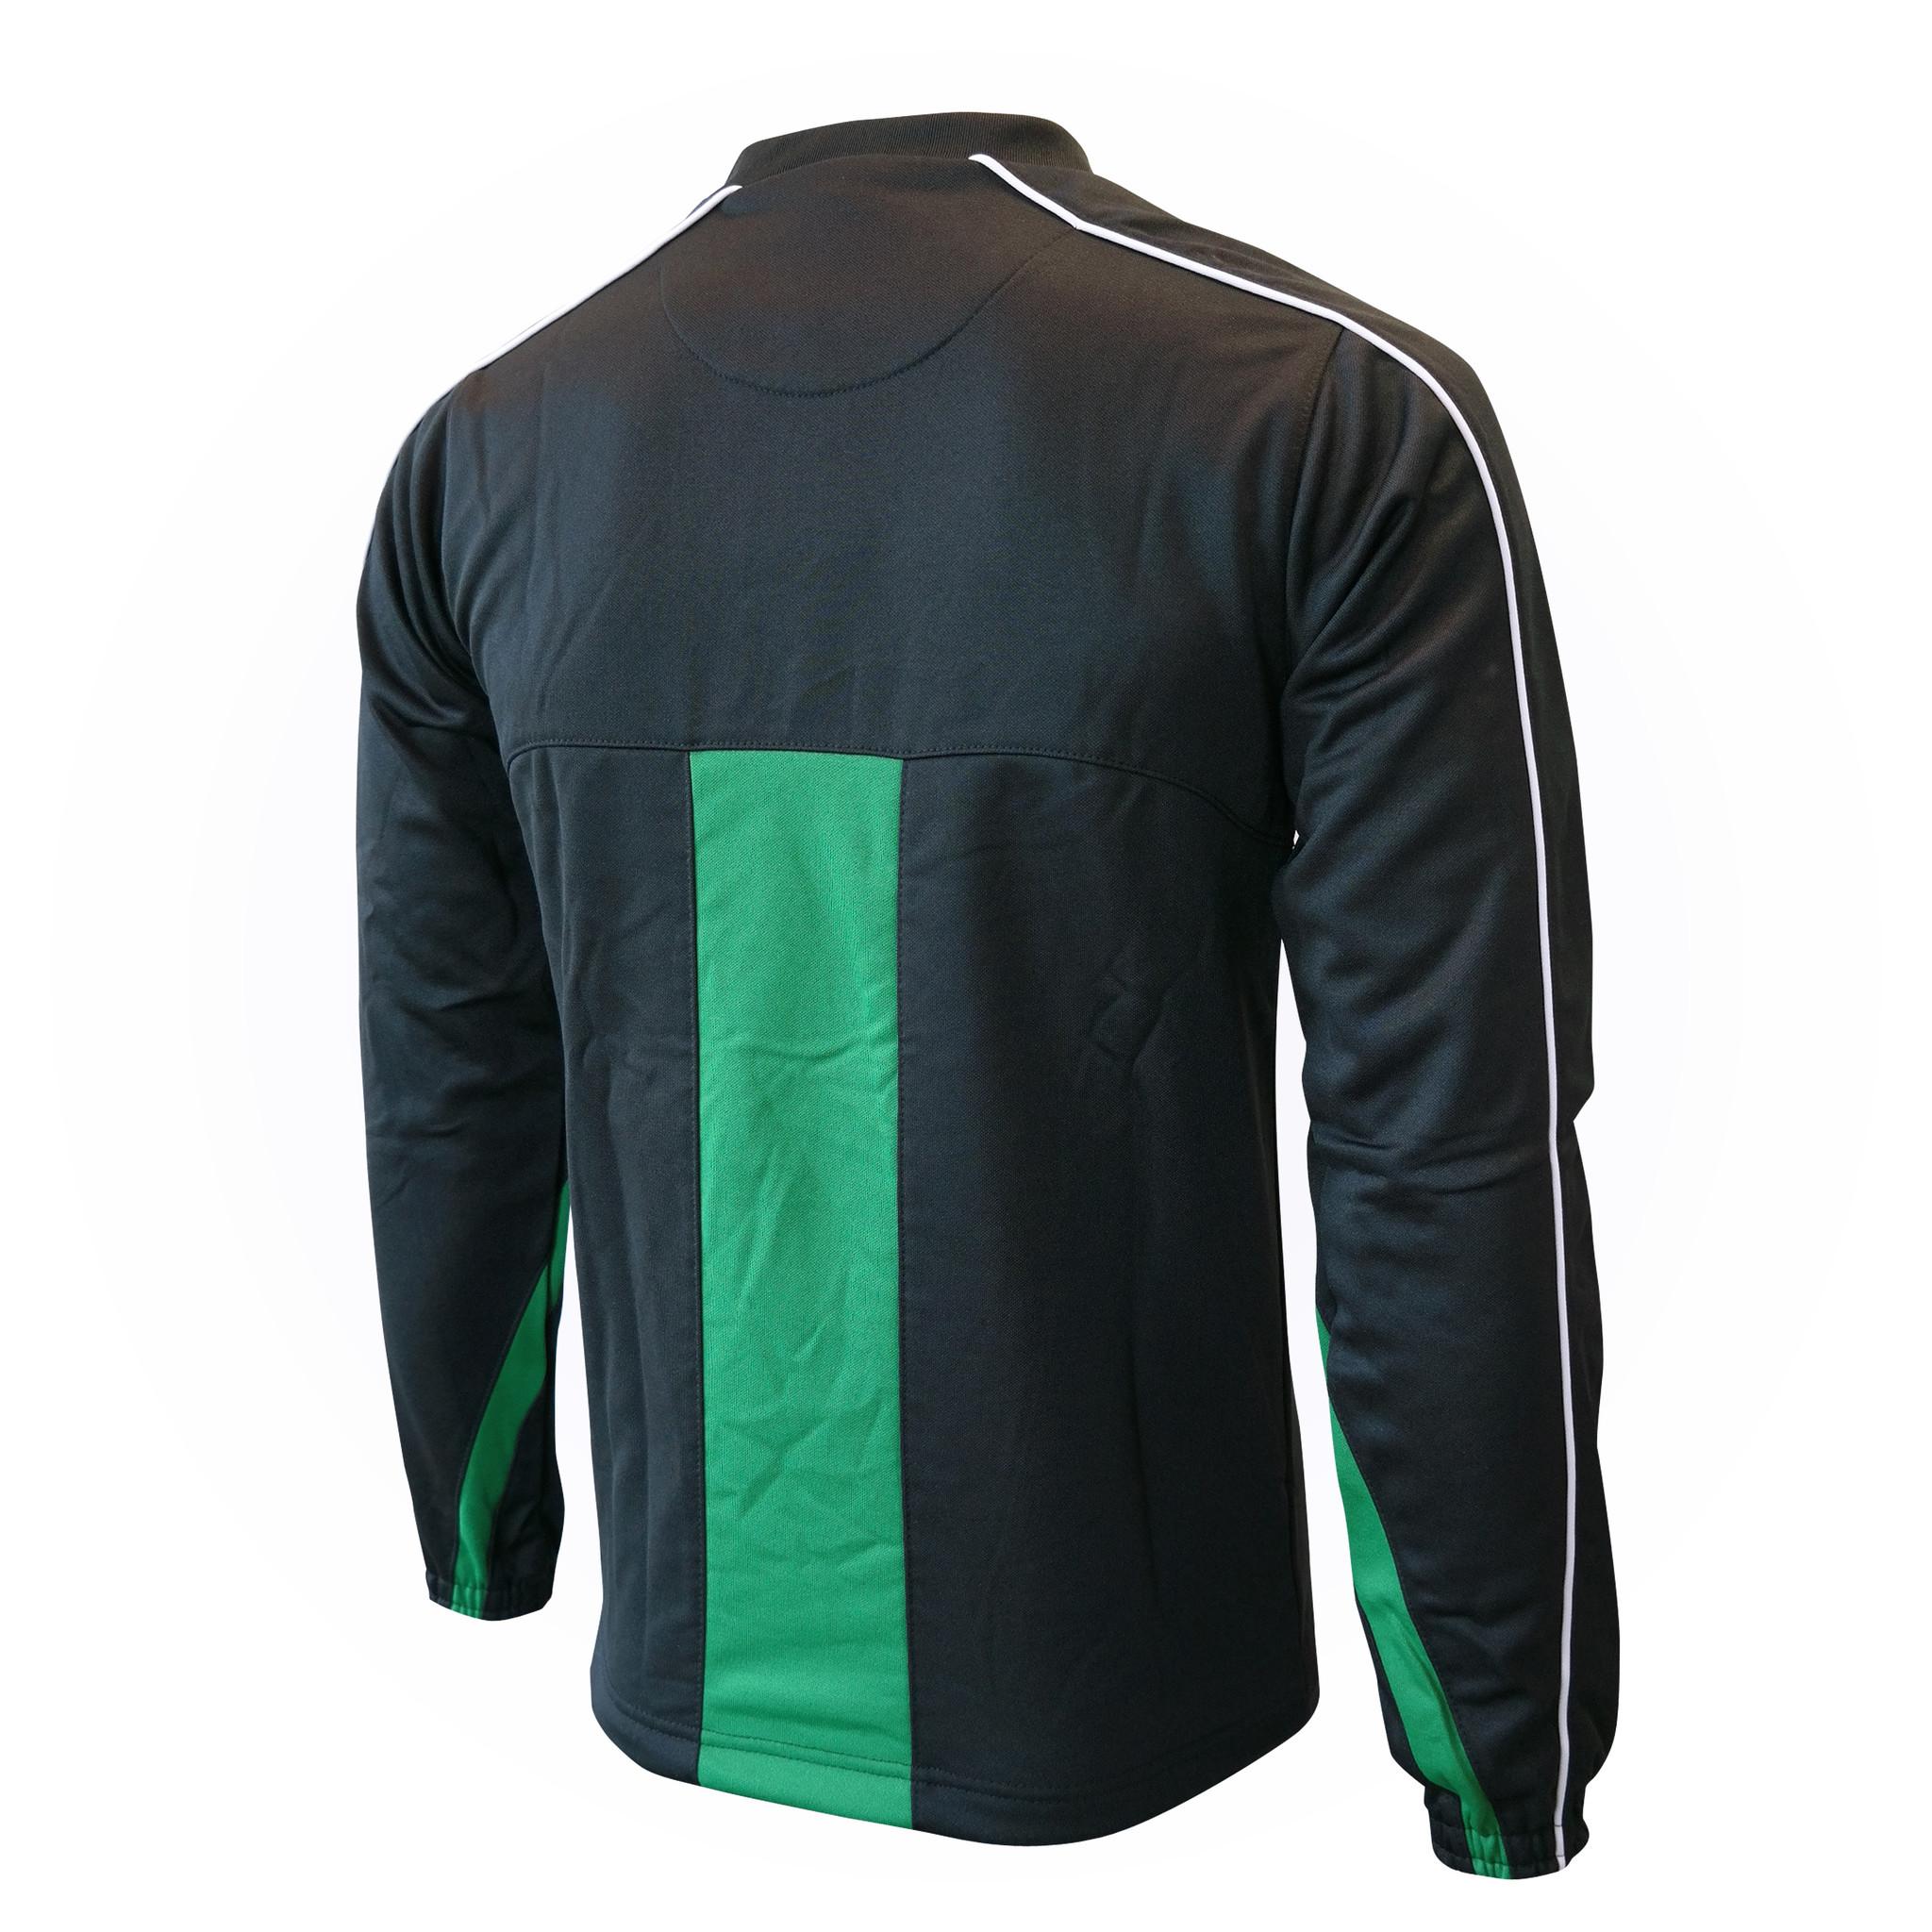 Velo Trui, Zwart/Groen